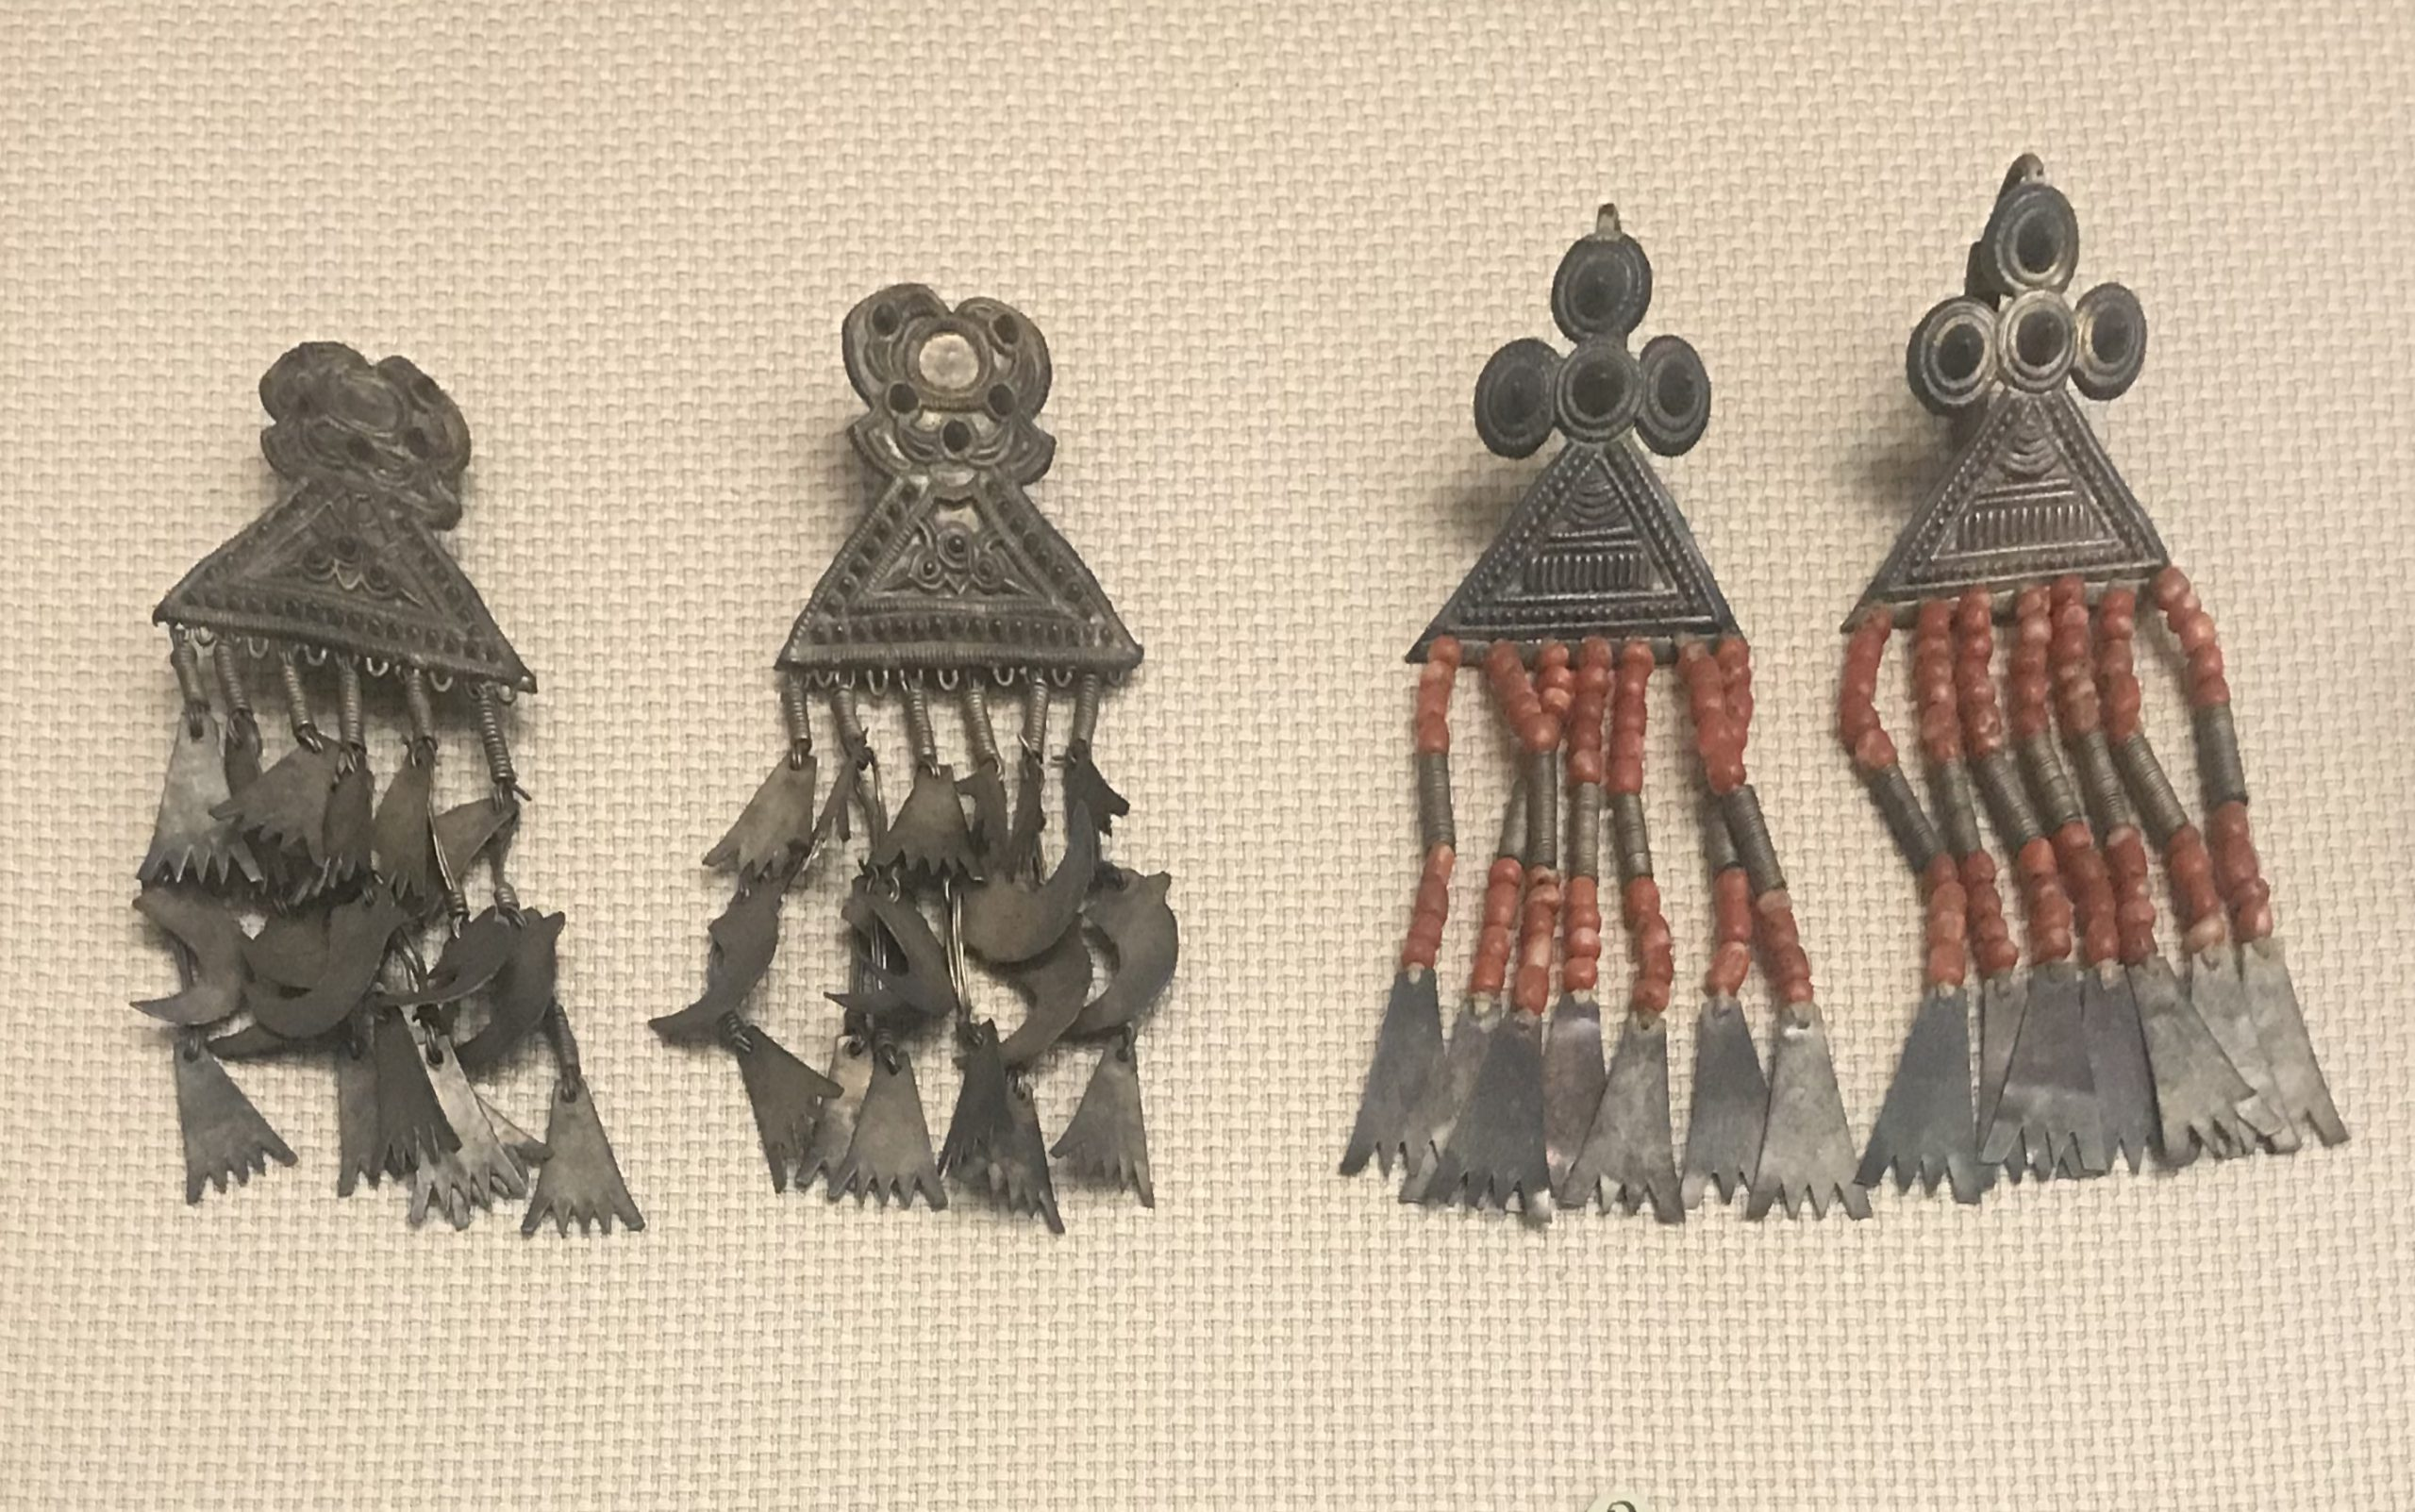 圓錐紋銀牌耳飾り-四錐銀牌珠耳飾り-彜族アクセサリー-四川民族文物館-四川博物館-成都